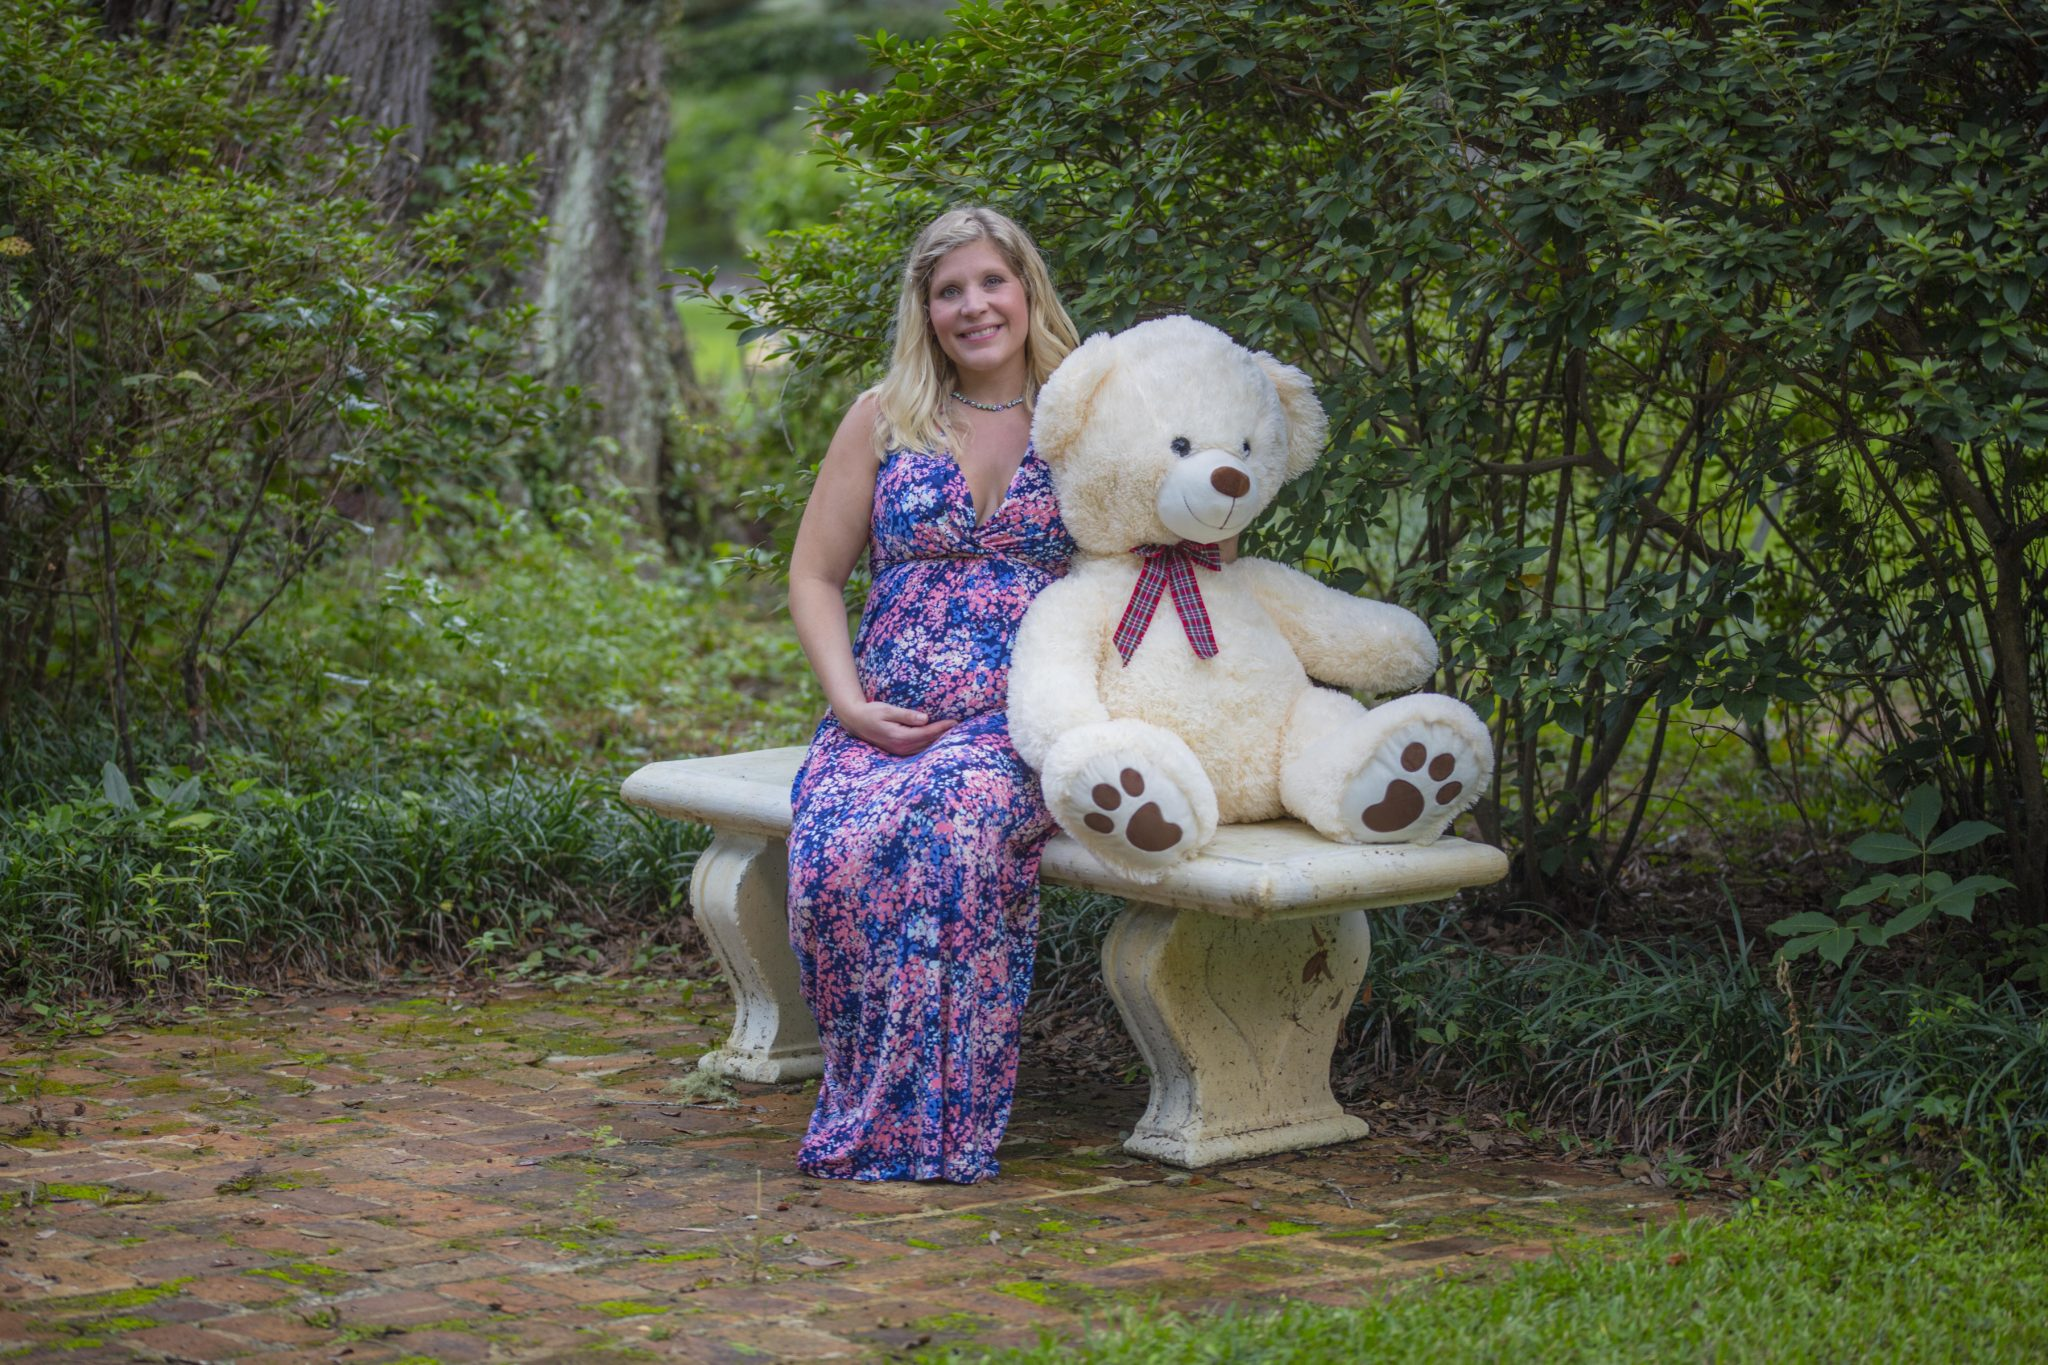 Jessica Pregnancy Photoshoot At Grayton Beach State Park